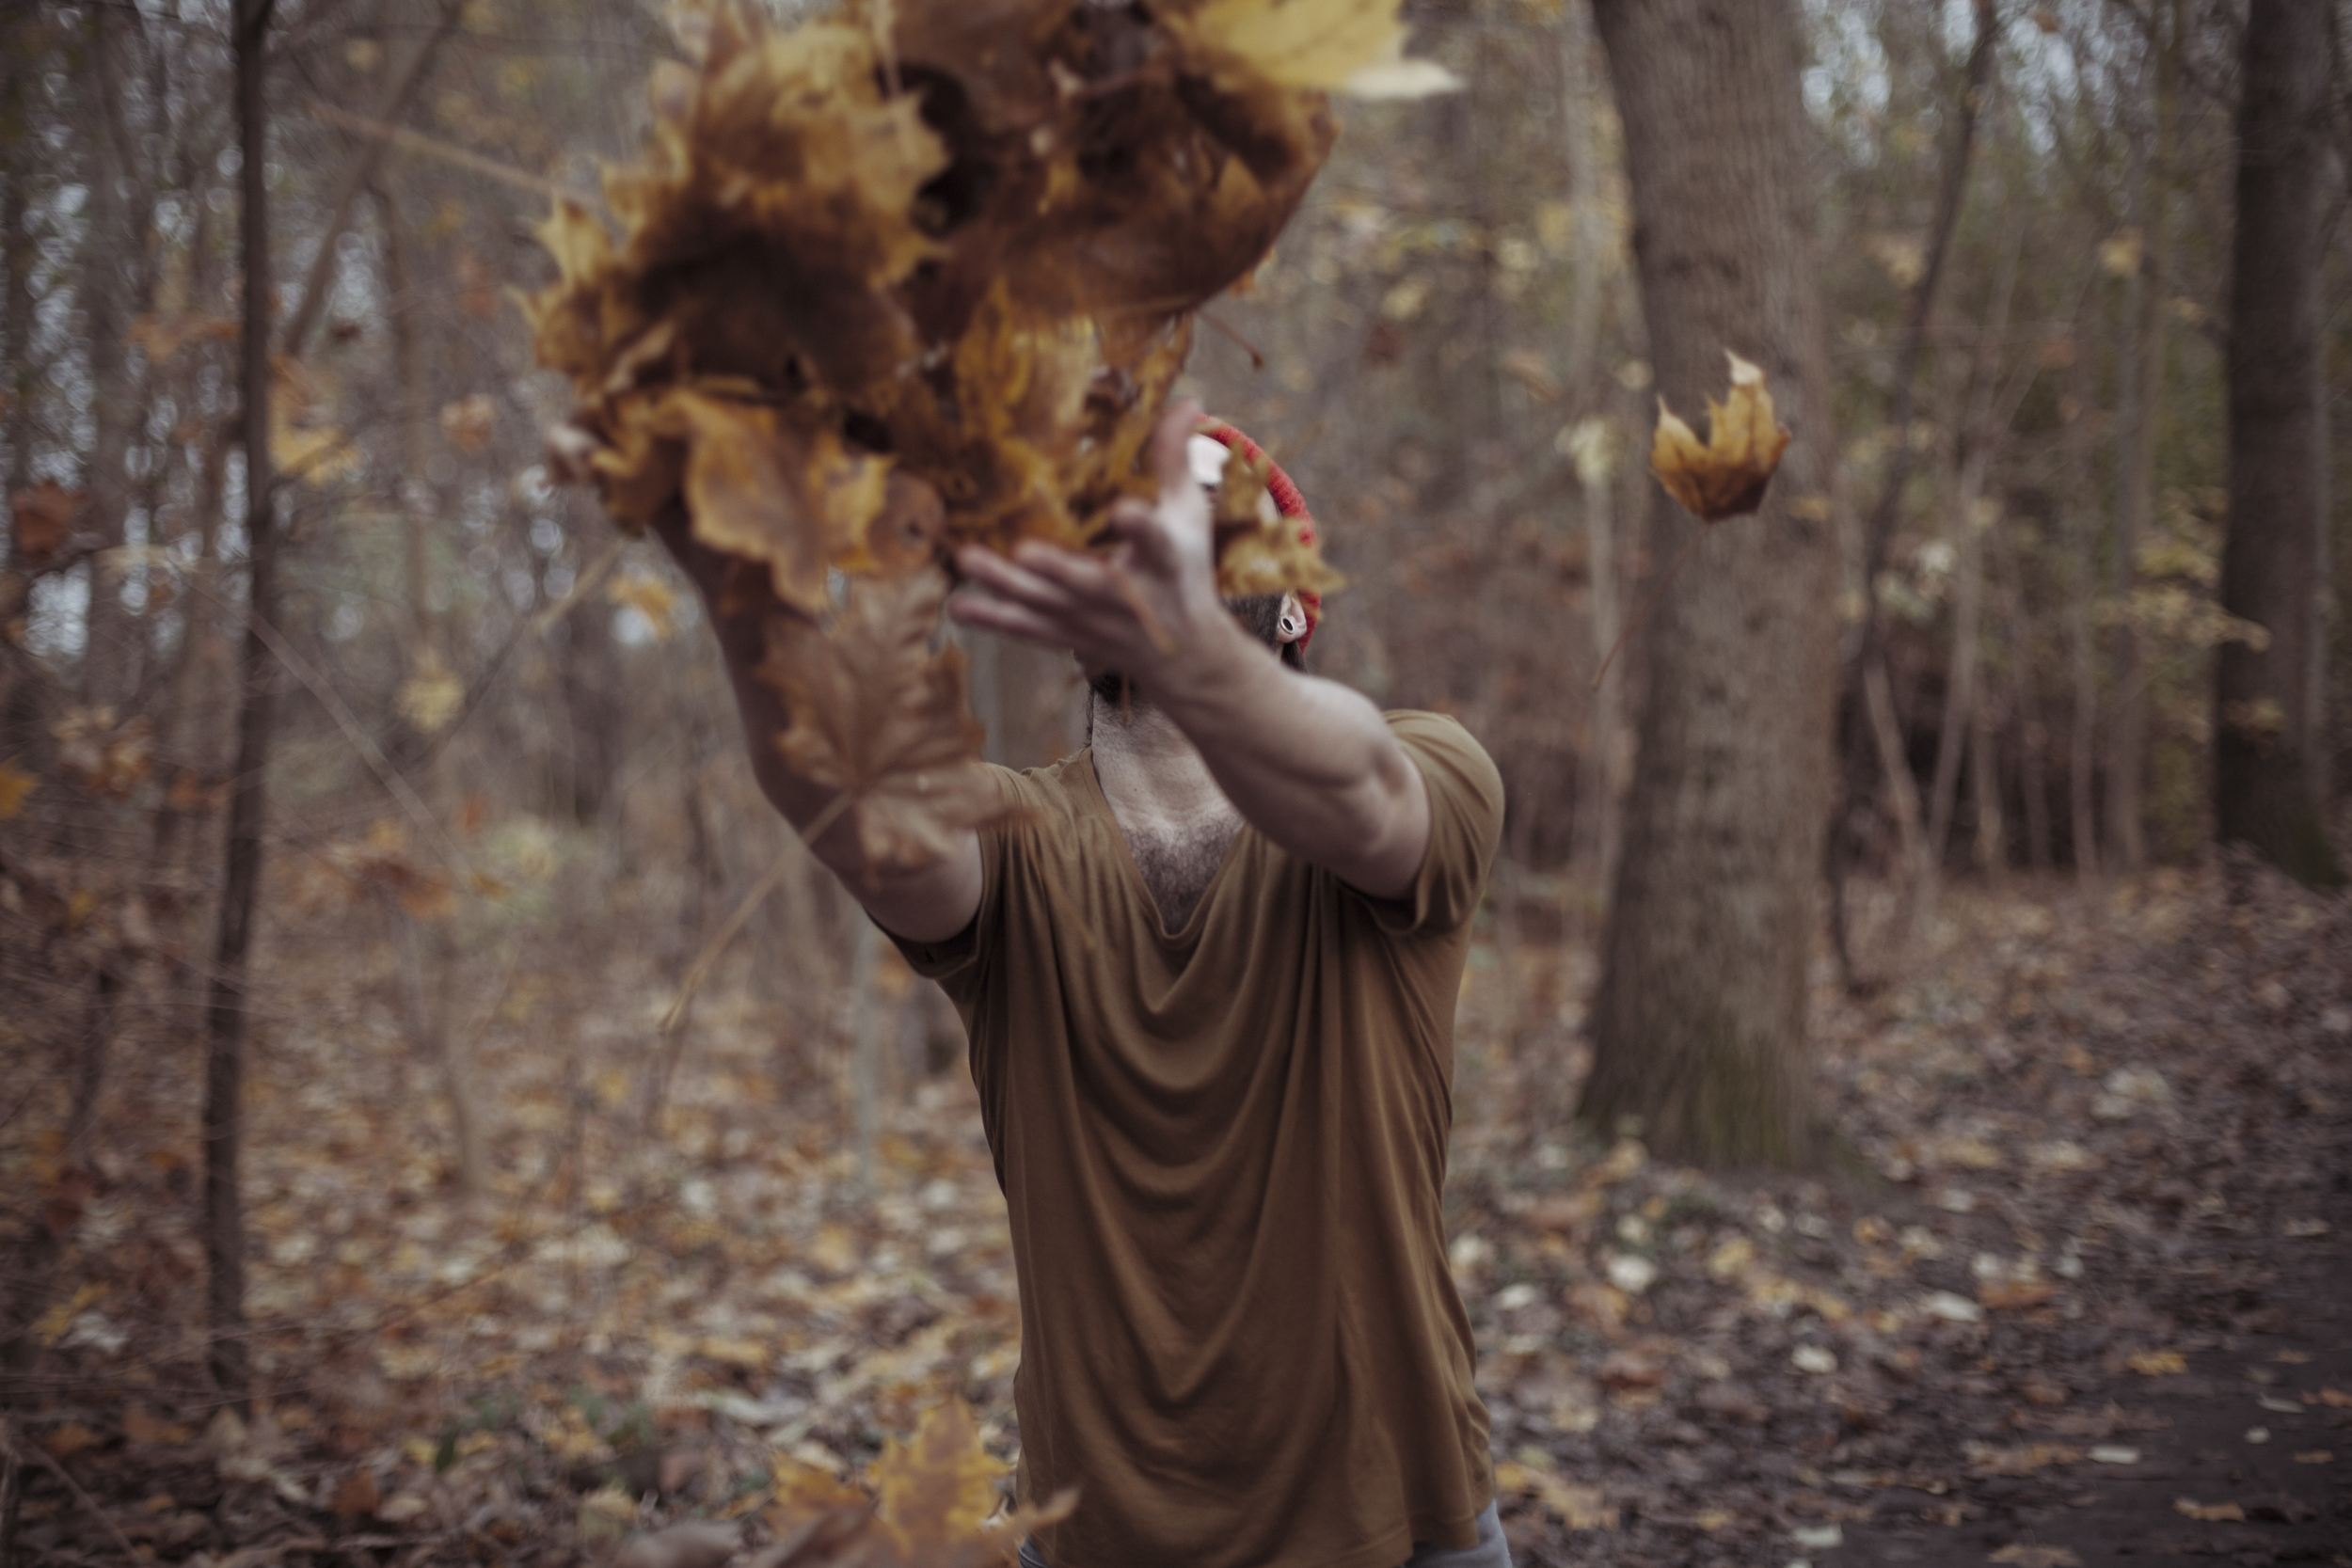 02_autumn-chris-by-sven-serkis-2014.jpg